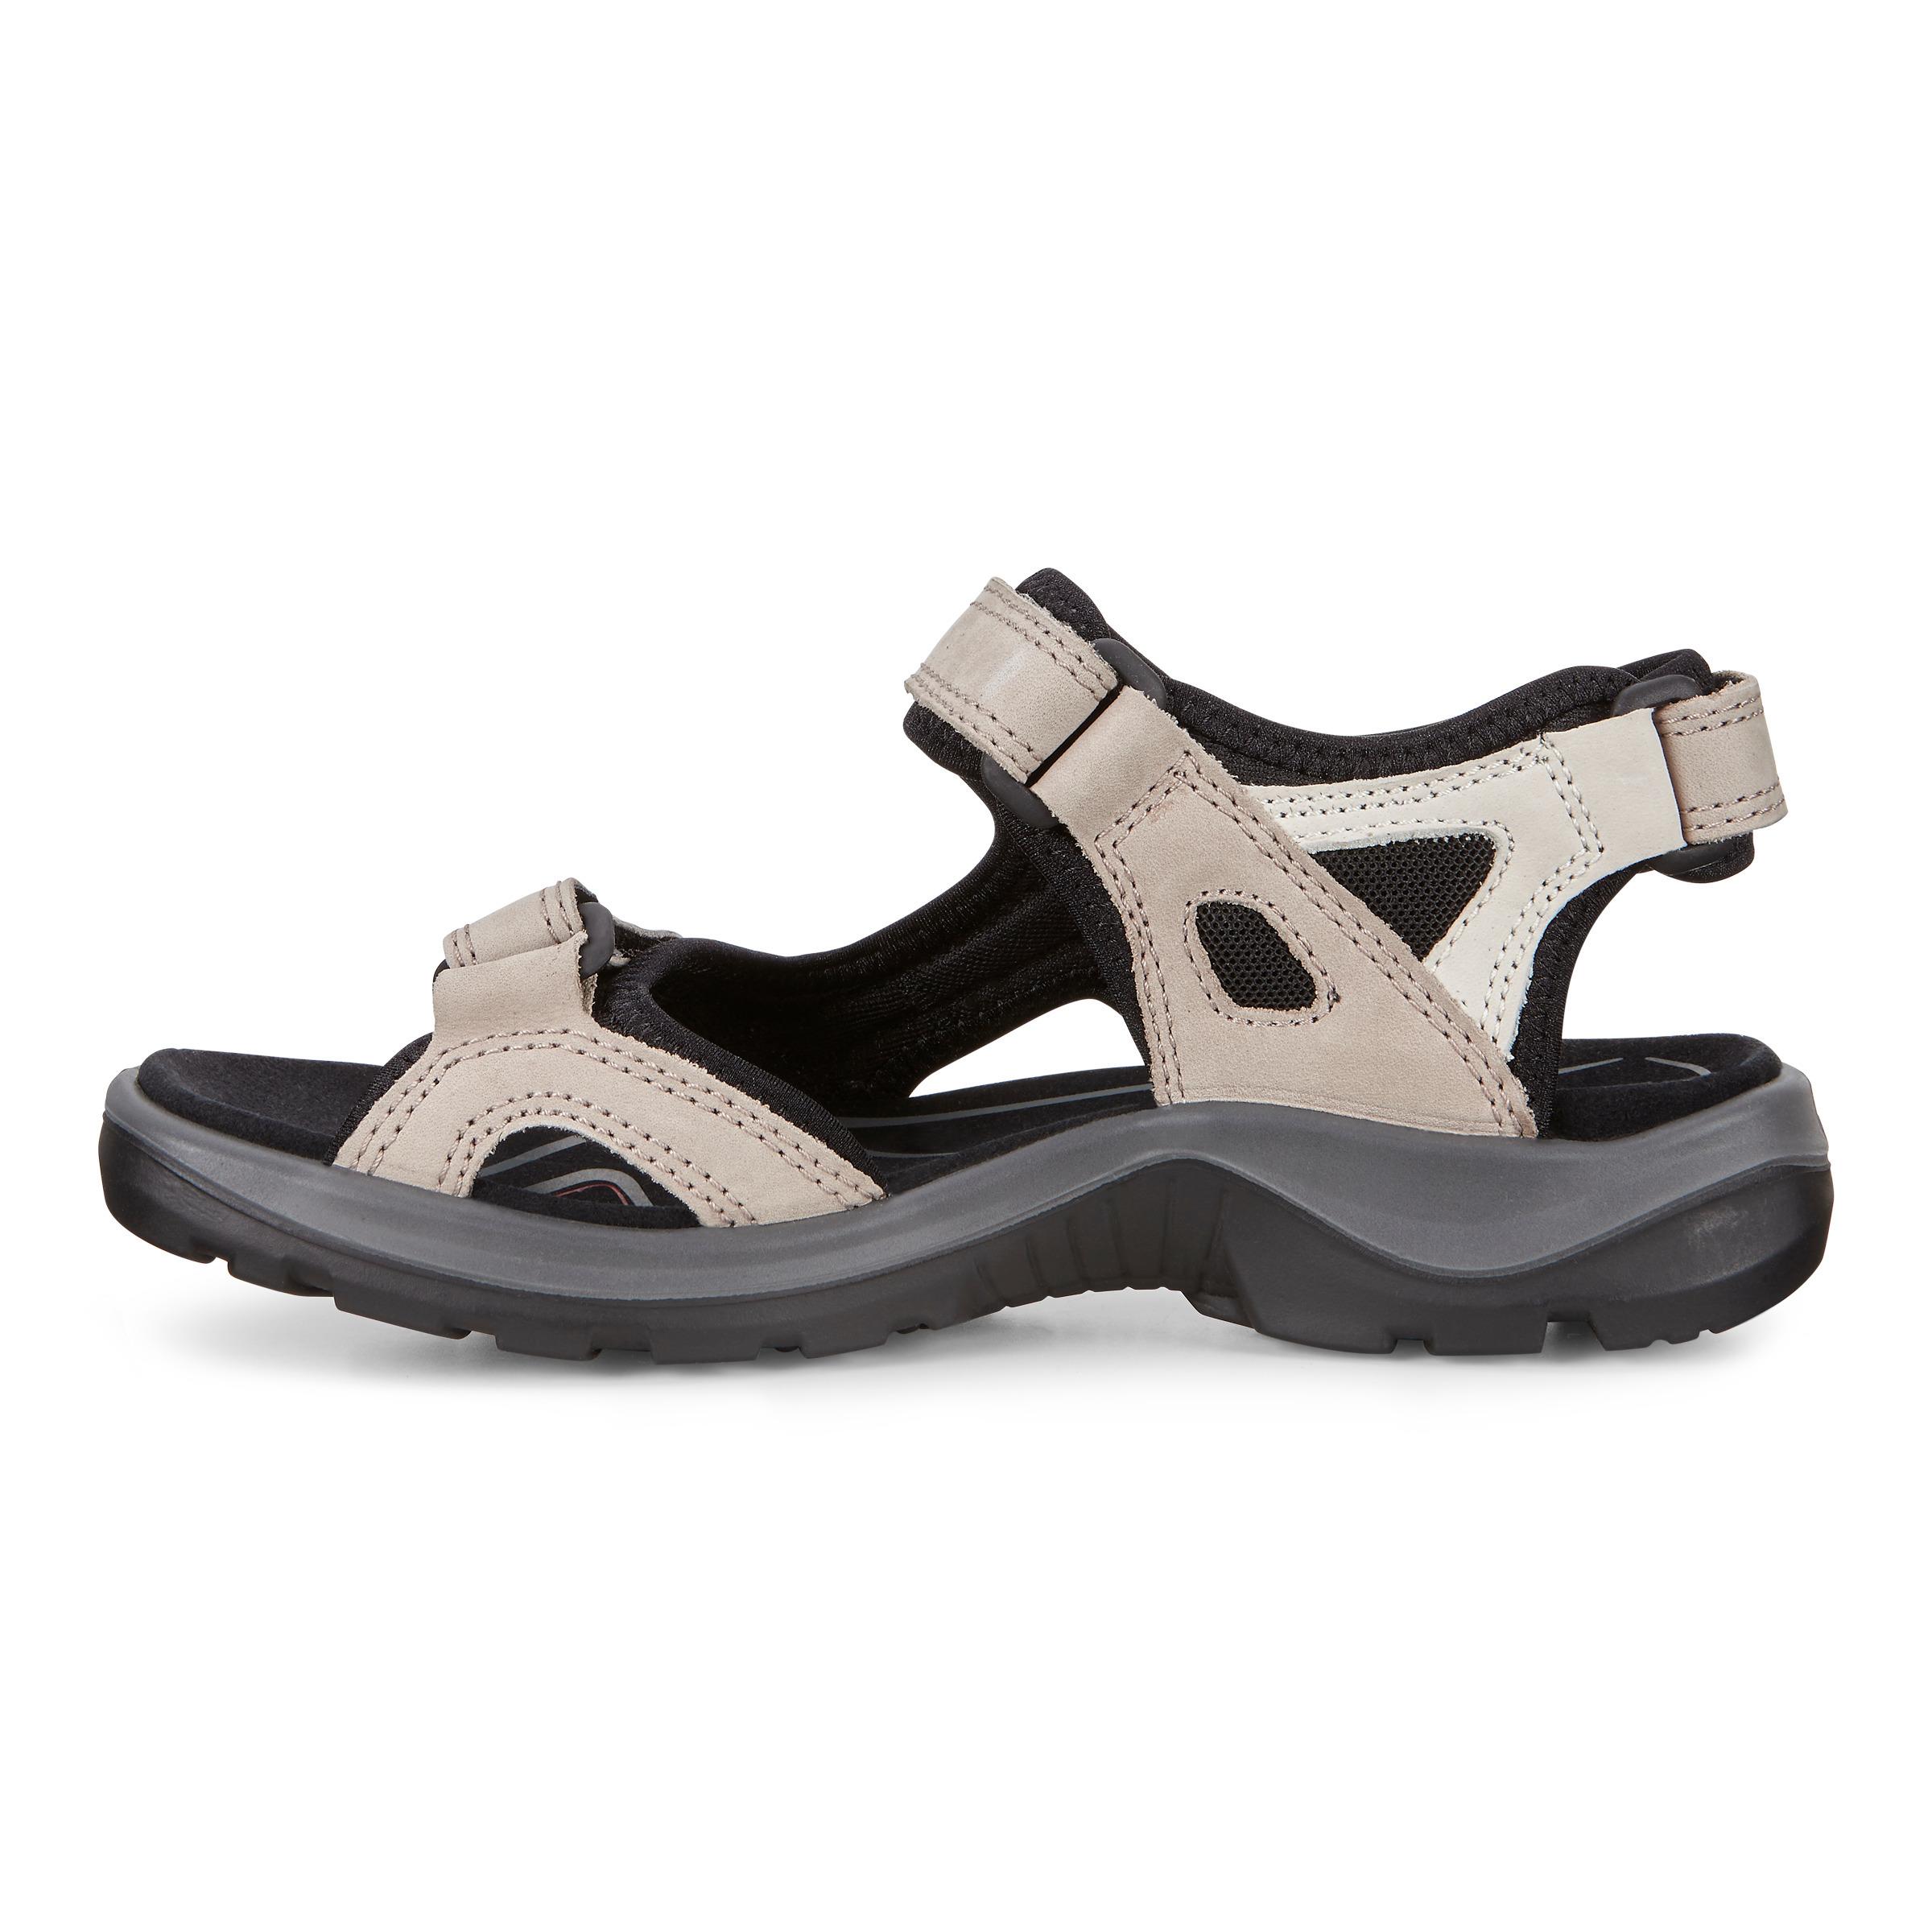 Ecco Offroad sandal, ice black, 36